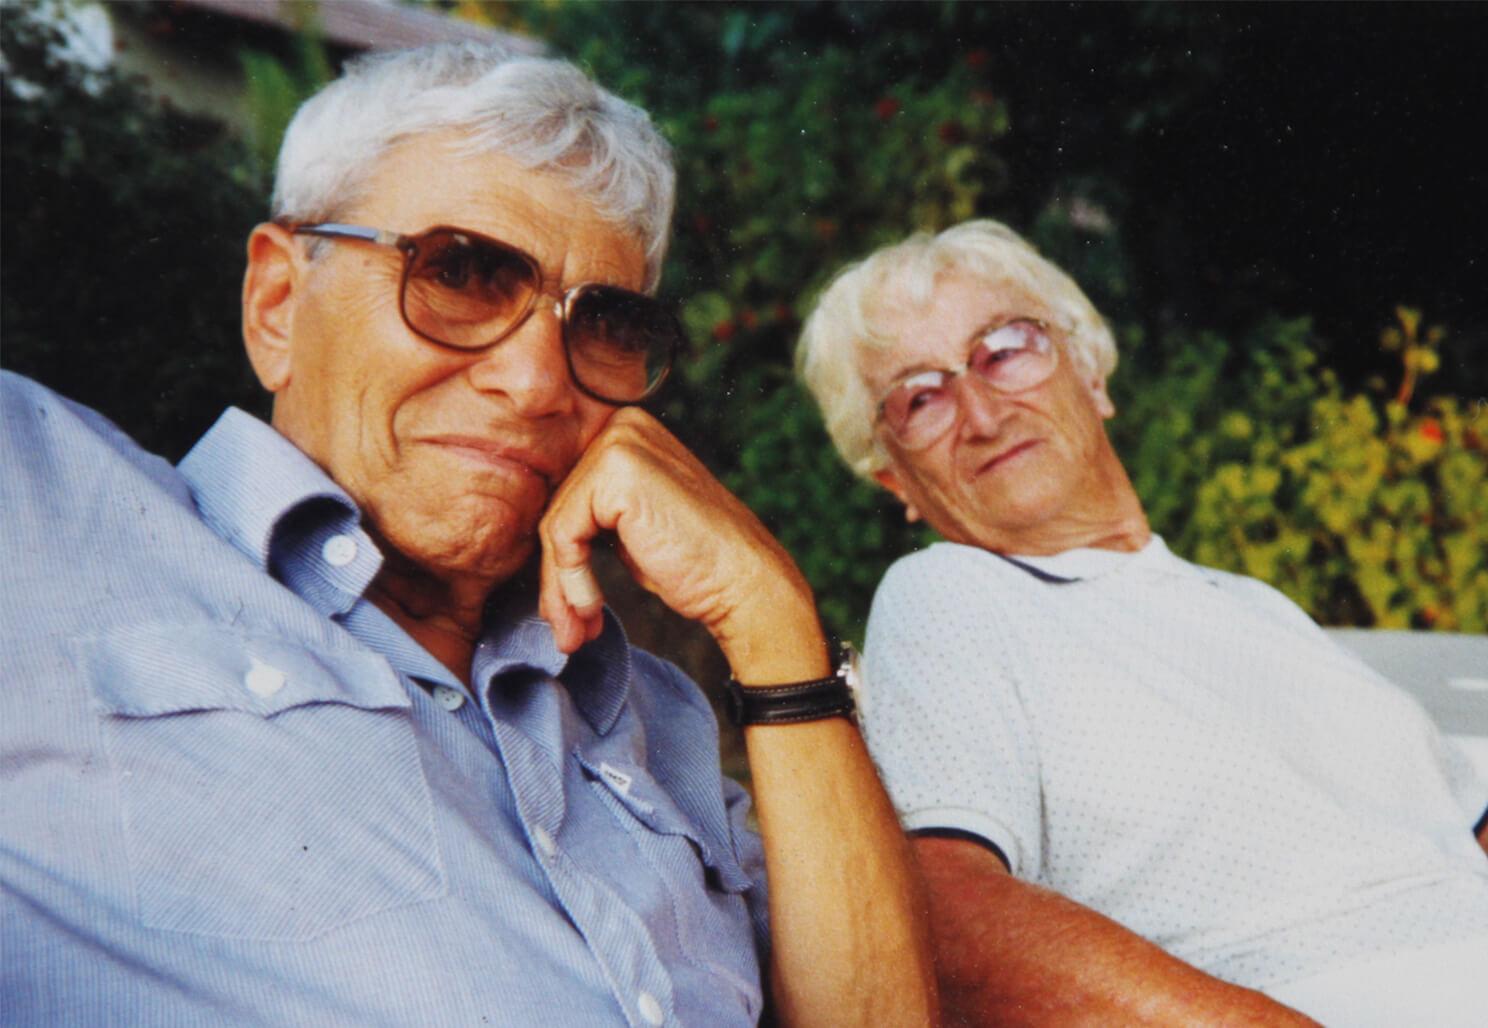 Yosef and Zilli